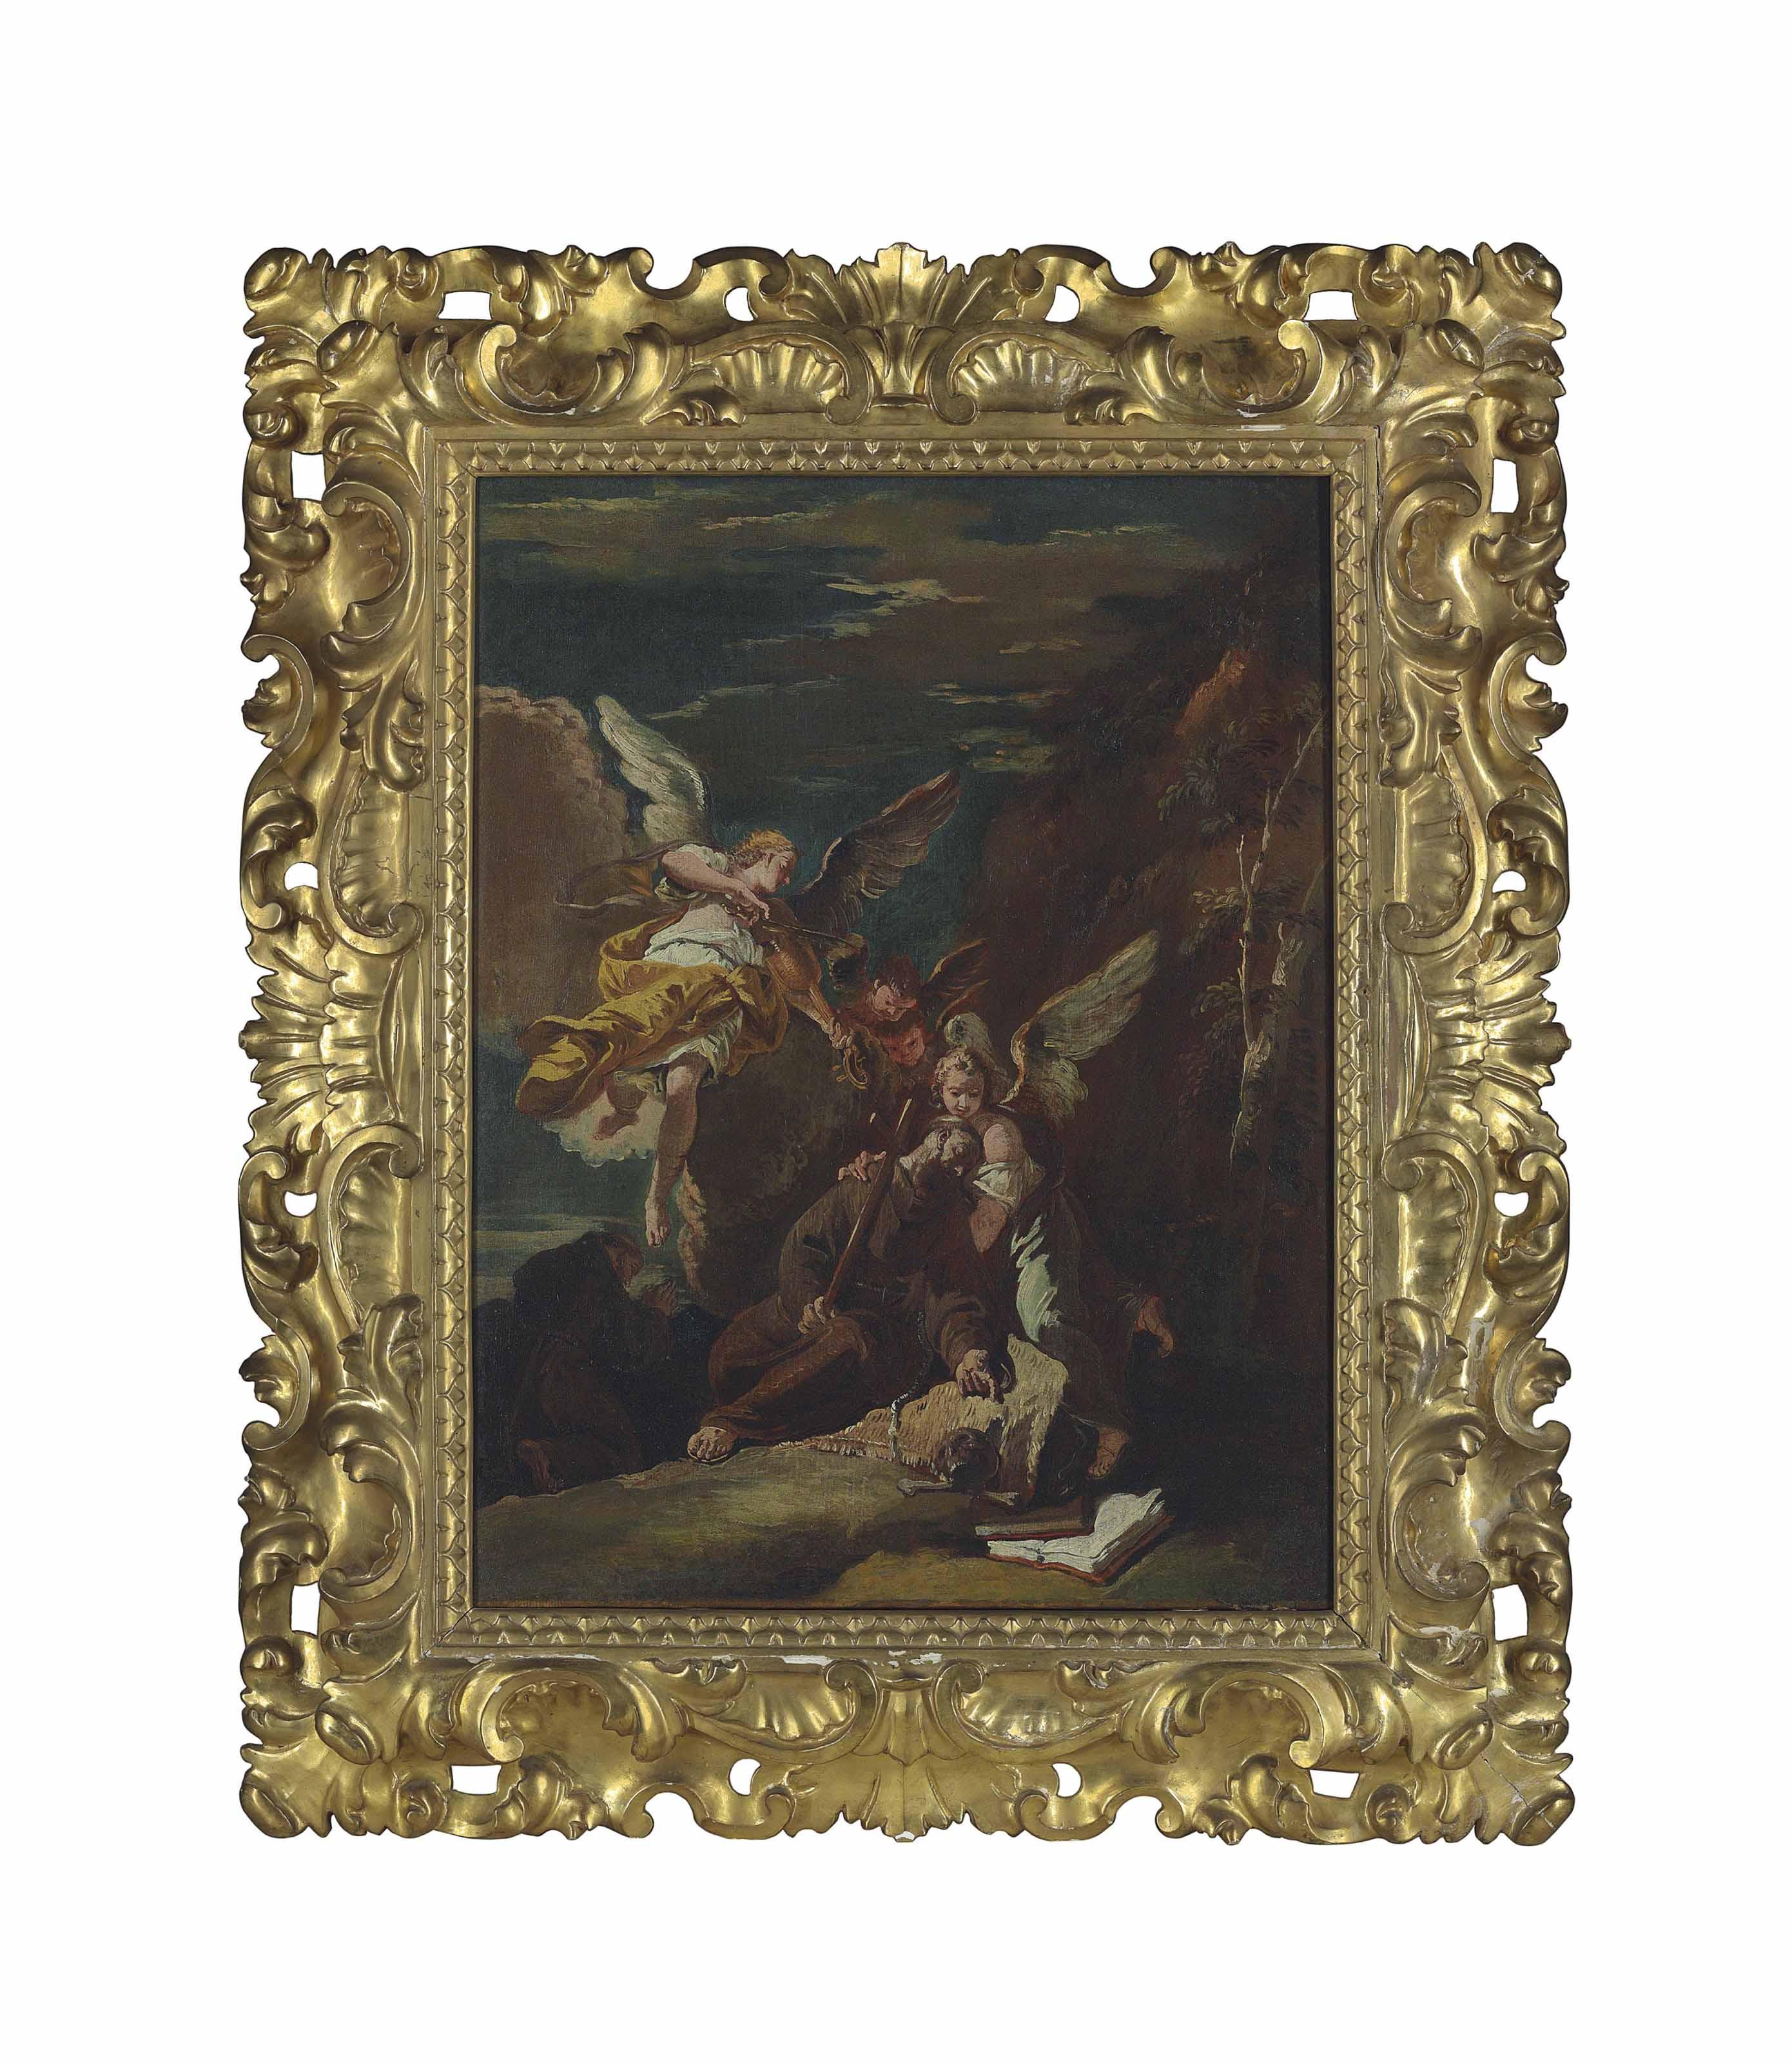 Attributed to Francesco Fontebasso (Venice 1707-1769)